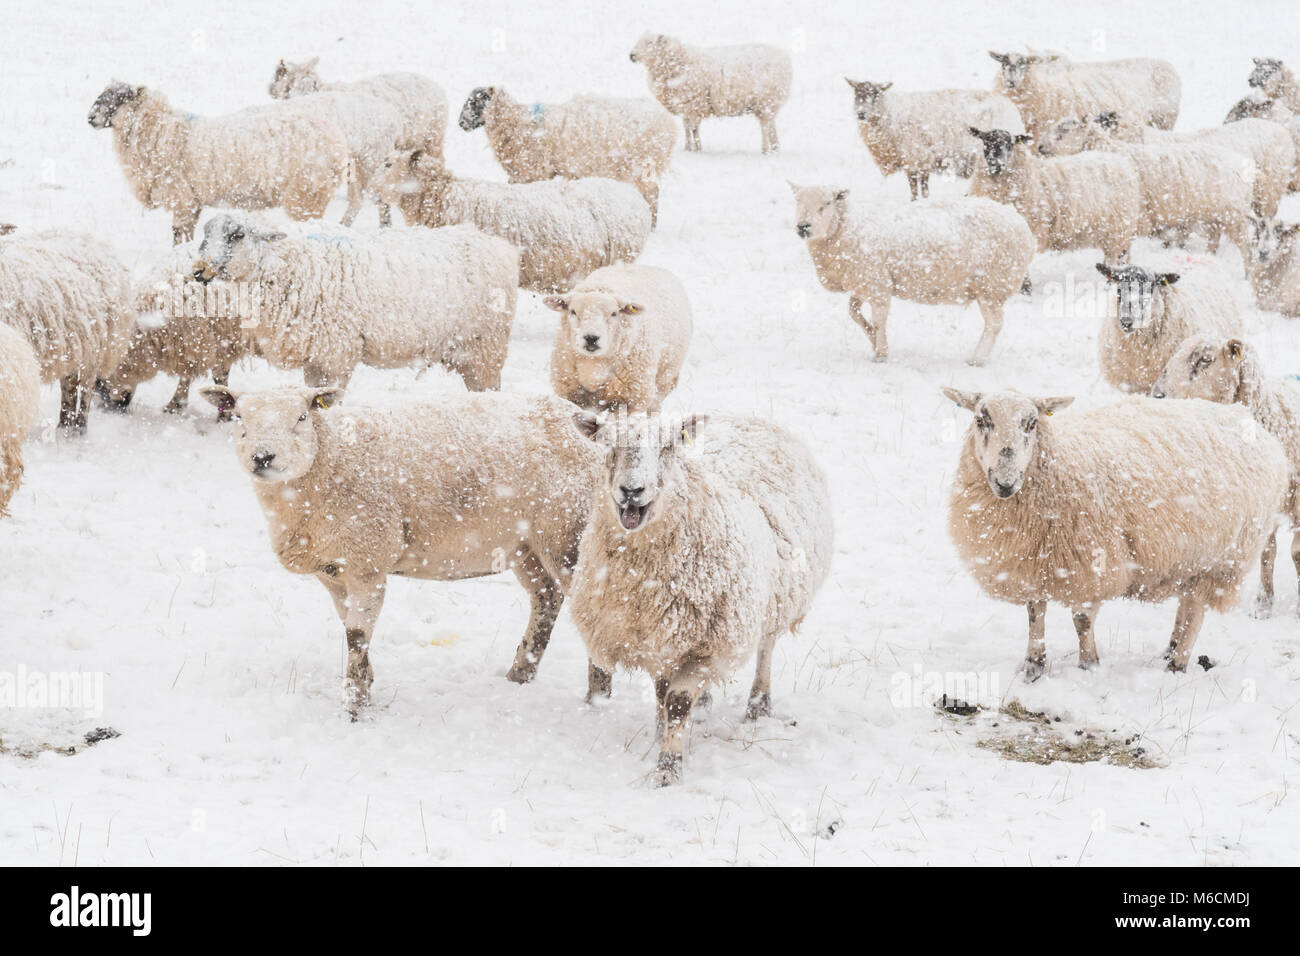 Sheep in snow - Scotland, UK - Stock Image